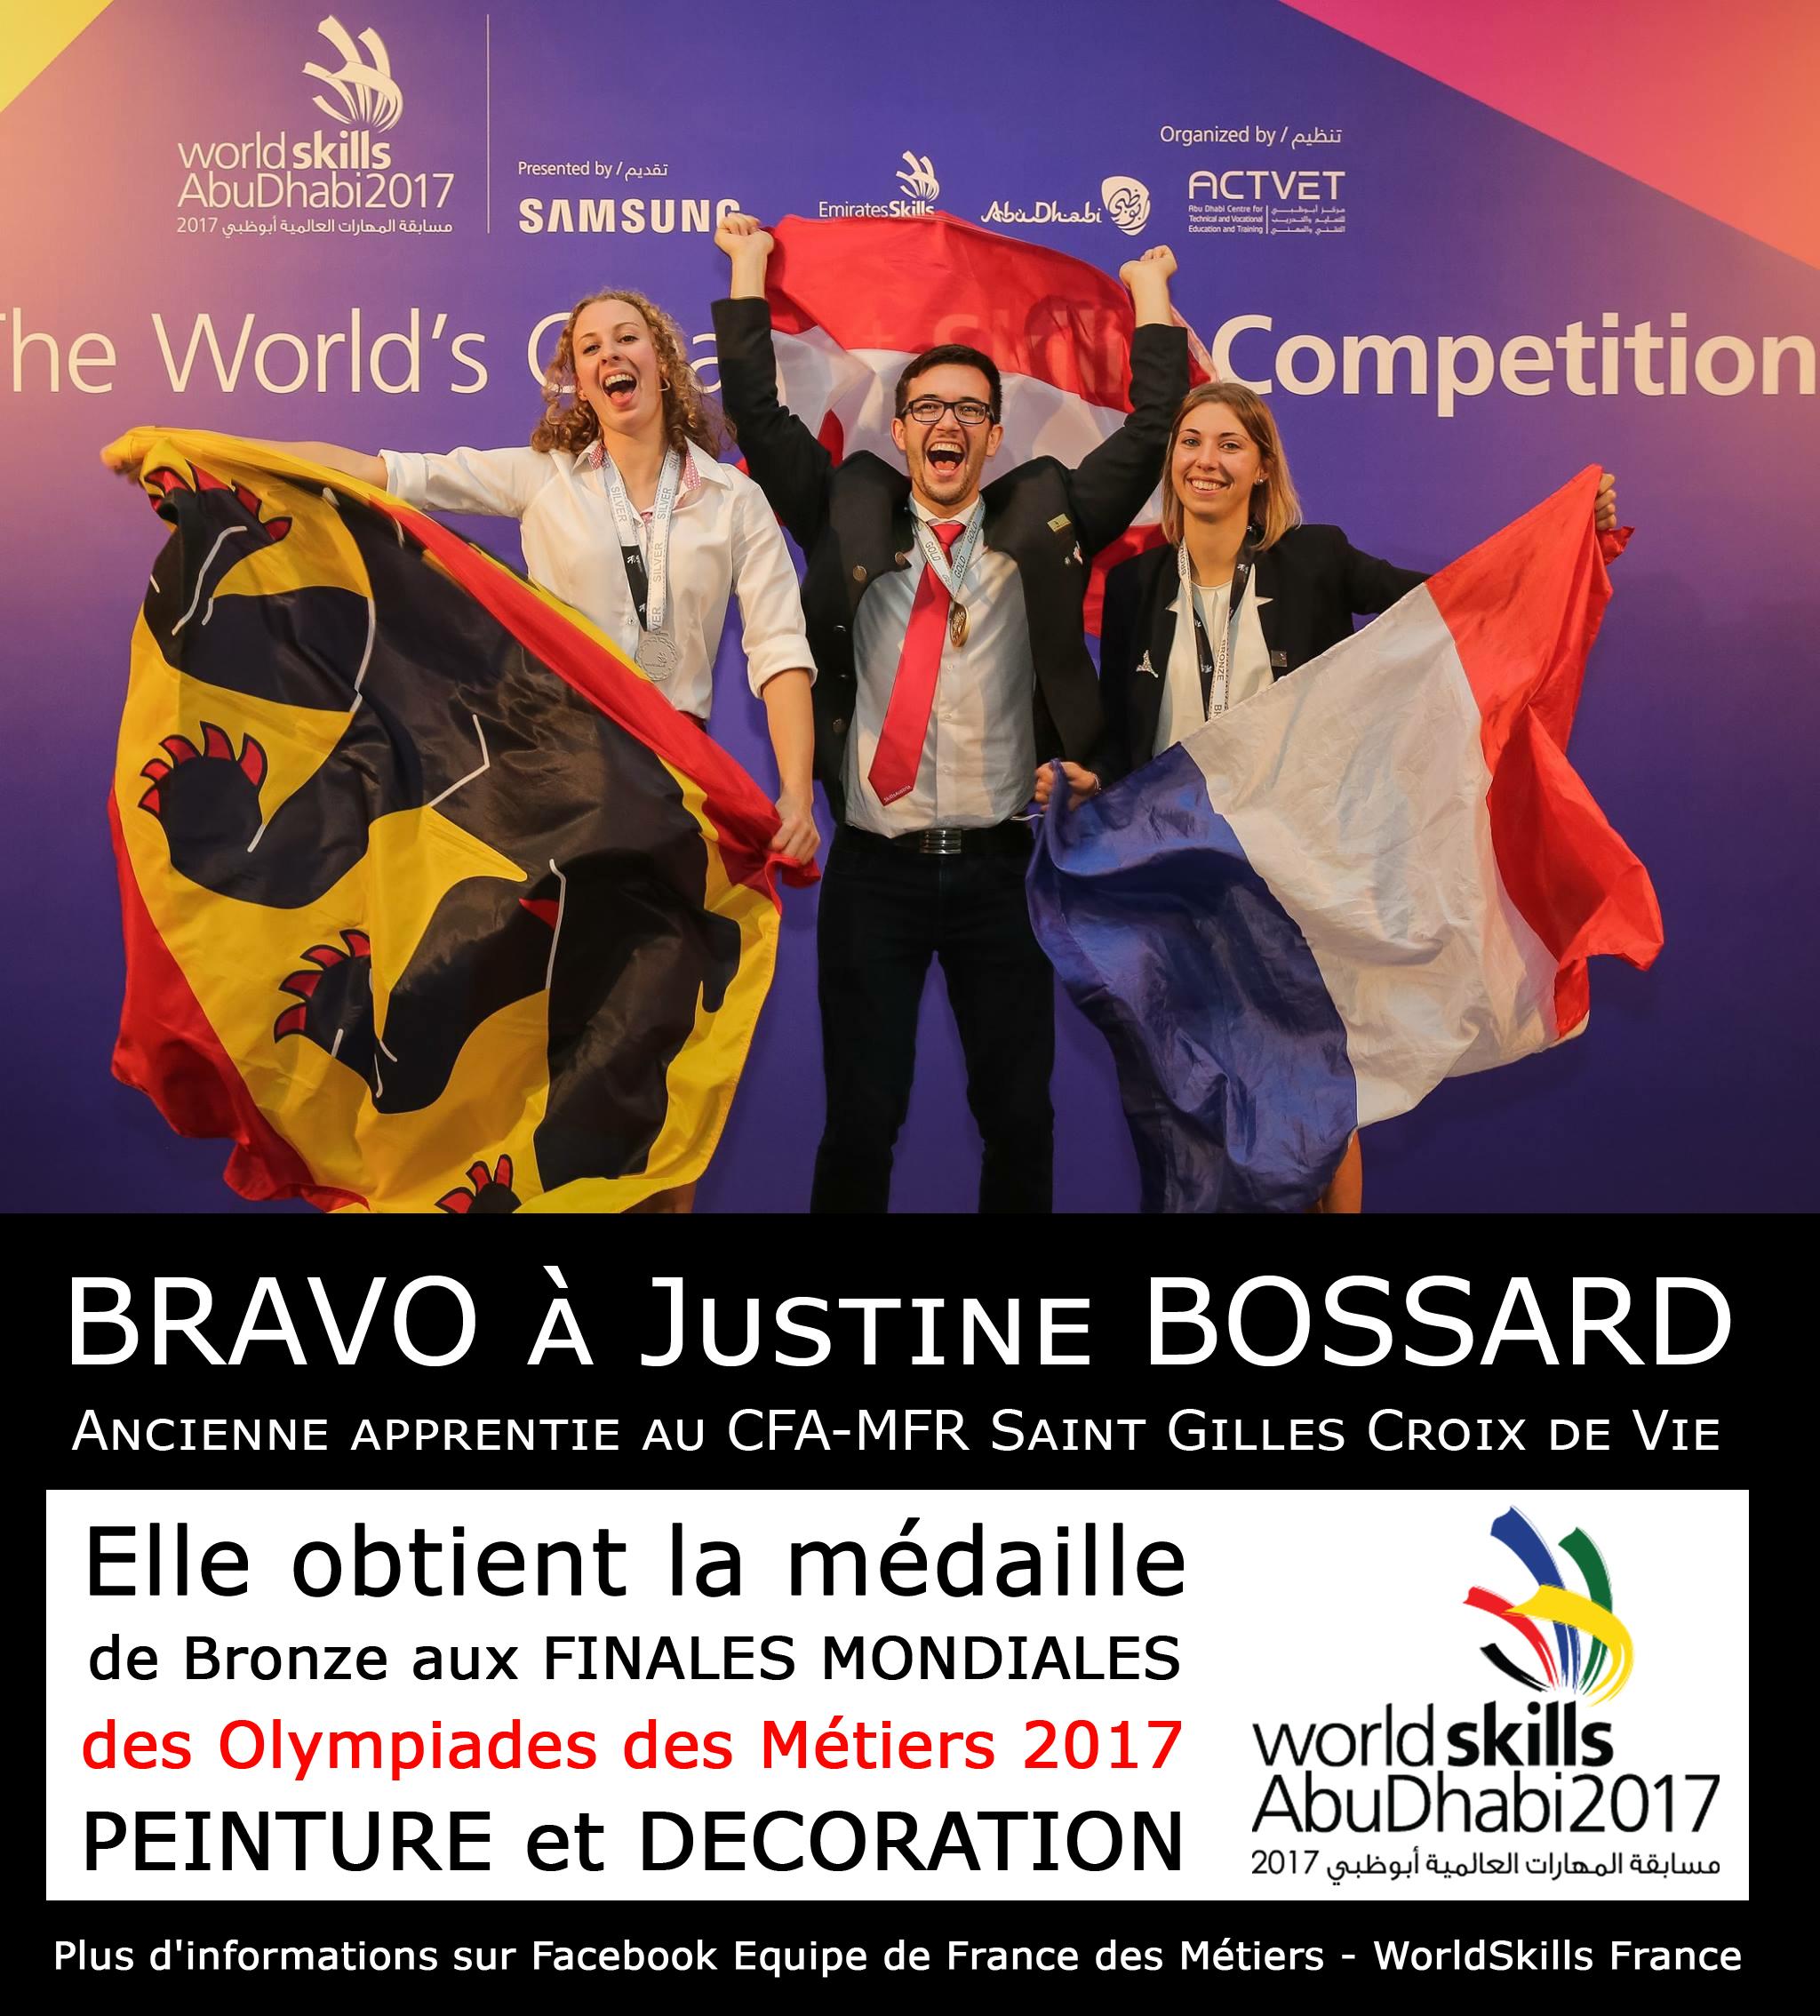 Justine_B_EquipeDeFranceDesMétiers2